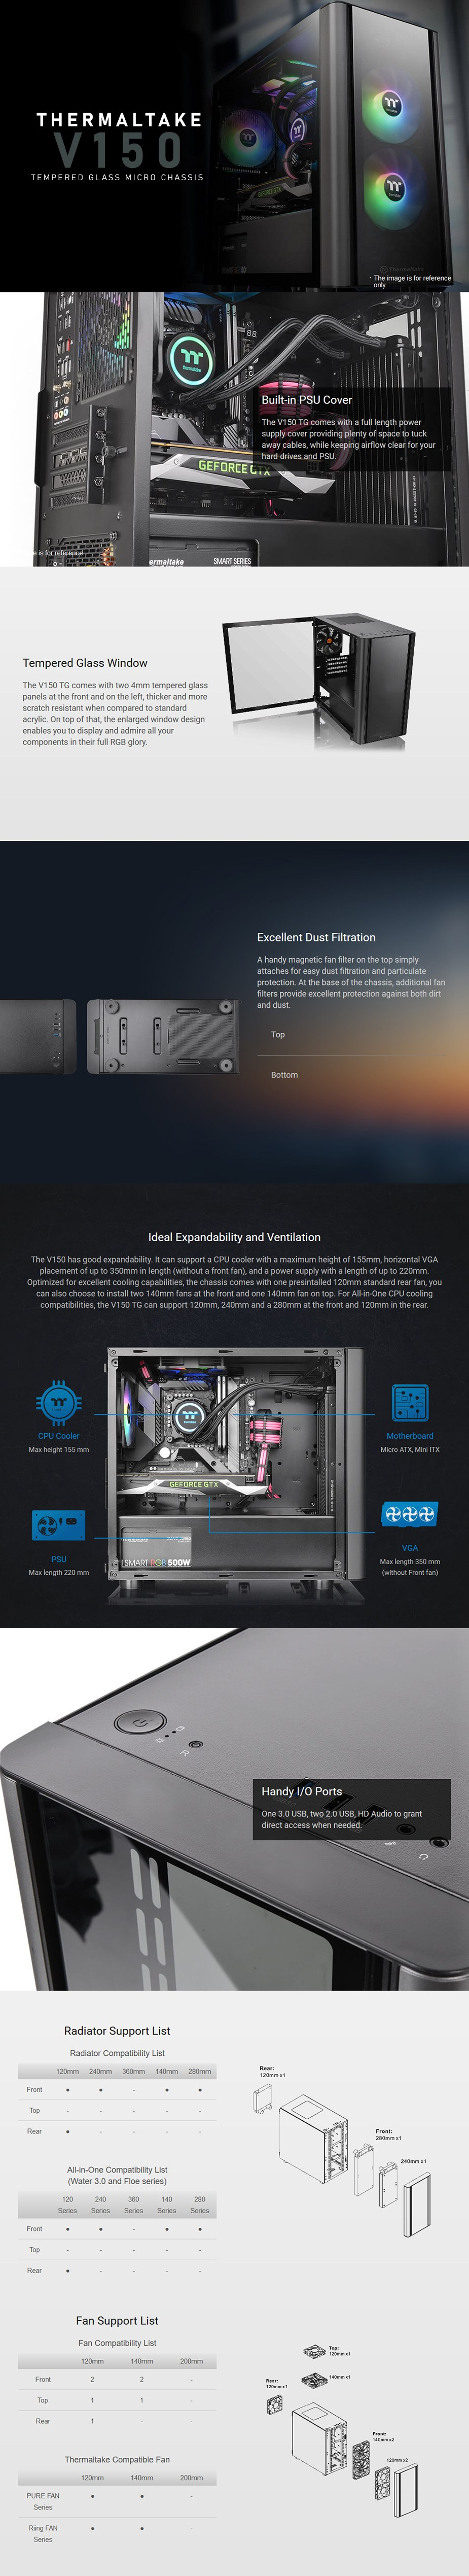 thermaltake_v150_tempered_glass_microatx_case_ac37183_7.jpg